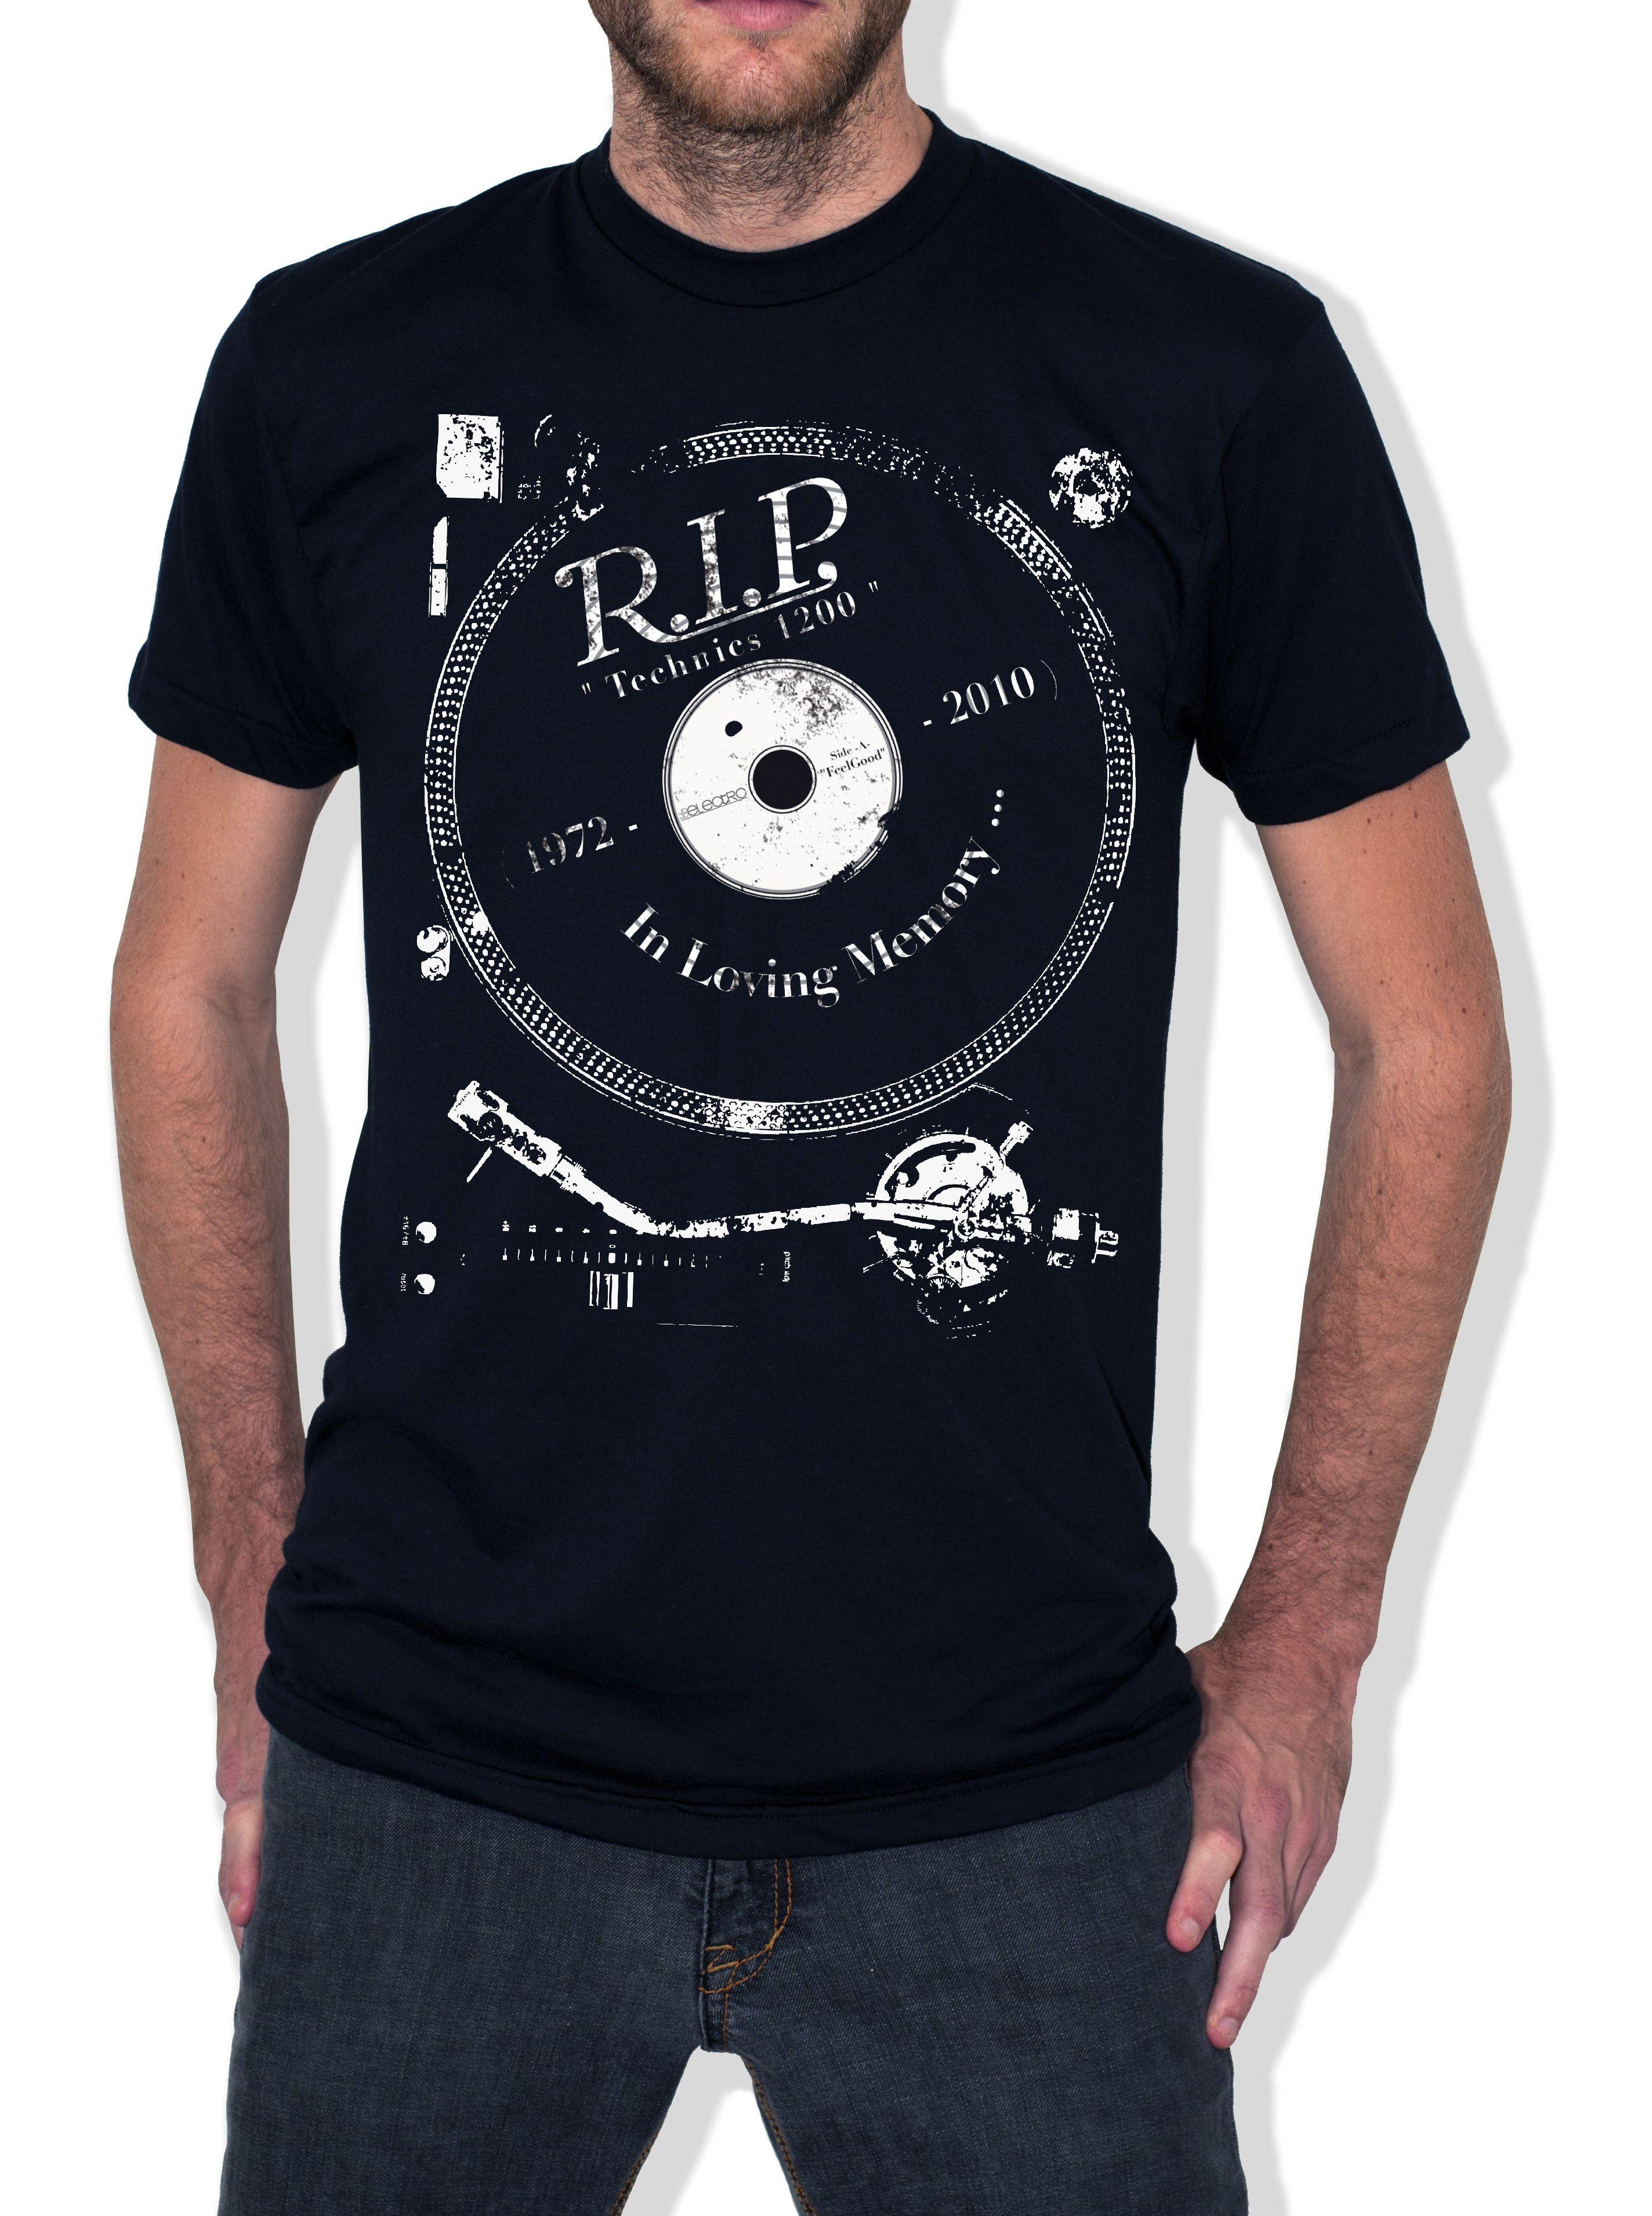 Shirt rip design - R I P Technics 1200 Tee Design A Global Brand Of Apparel